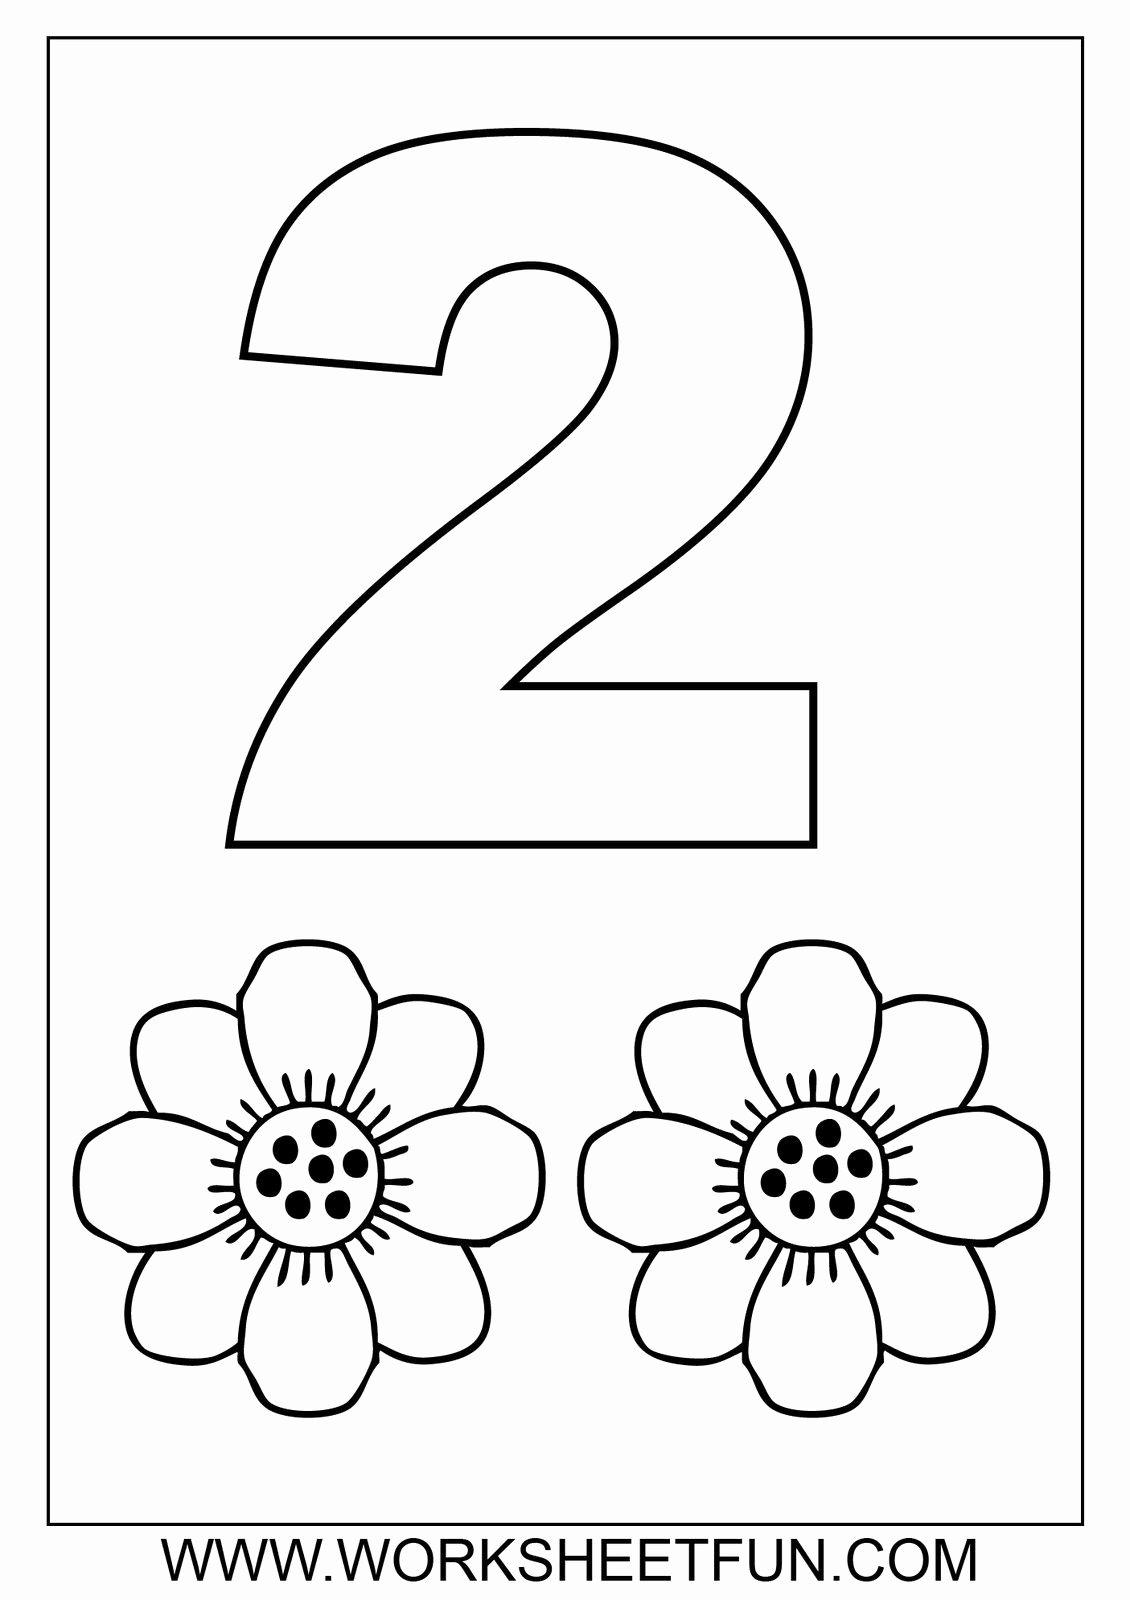 Plant Worksheets for Preschoolers Inspirational Number 7 Worksheets for Preschoolers 2 Plant Worksheet for